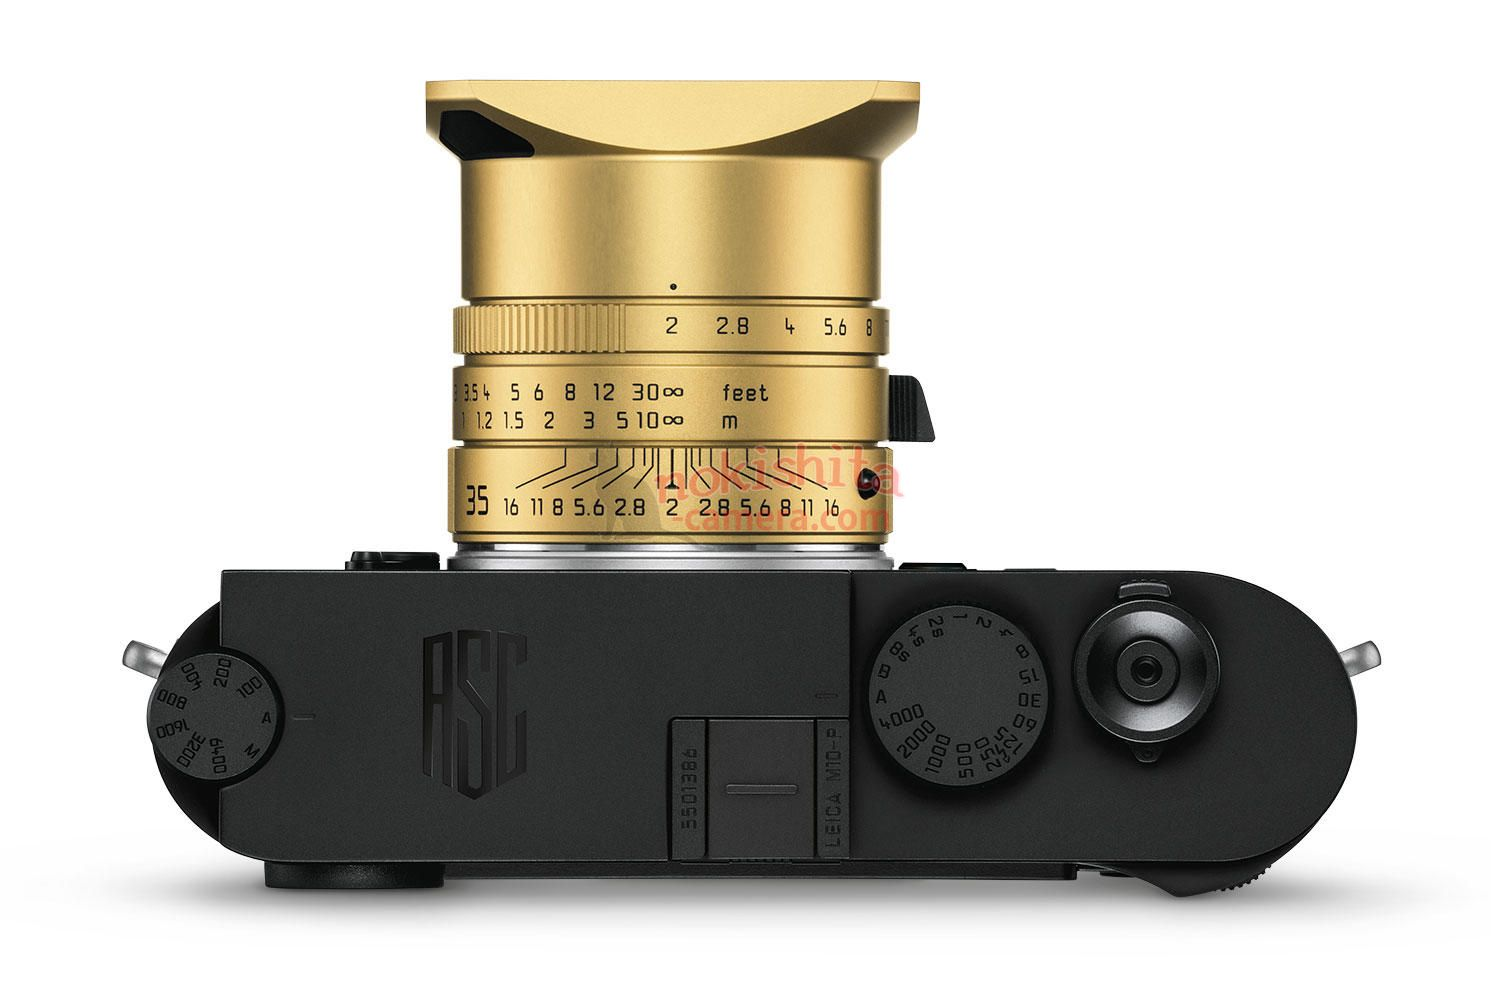 Leica M10-P for cinematographers